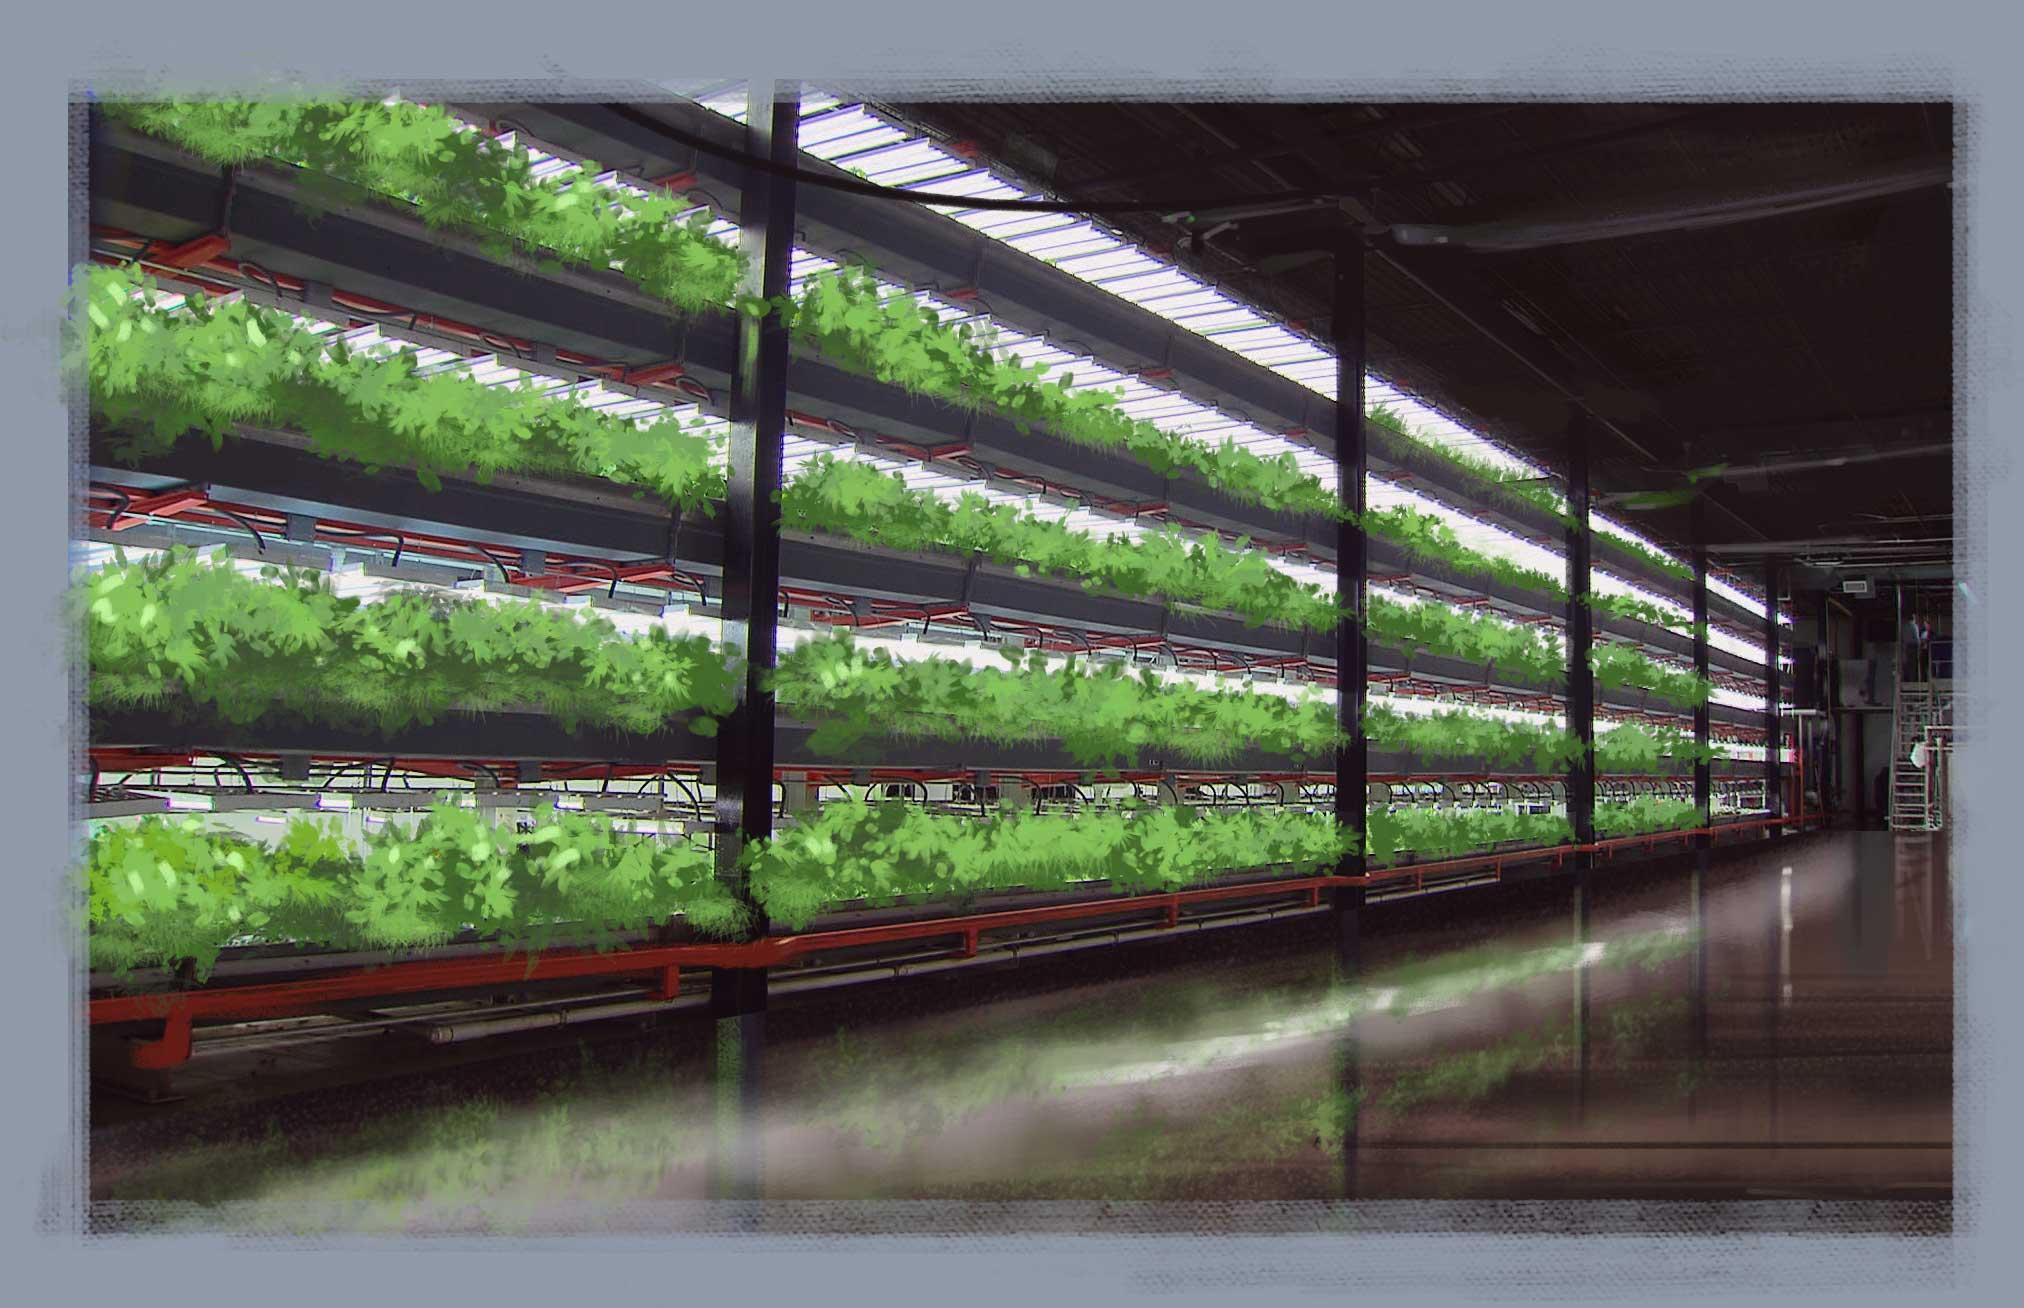 High yield Aero gardens